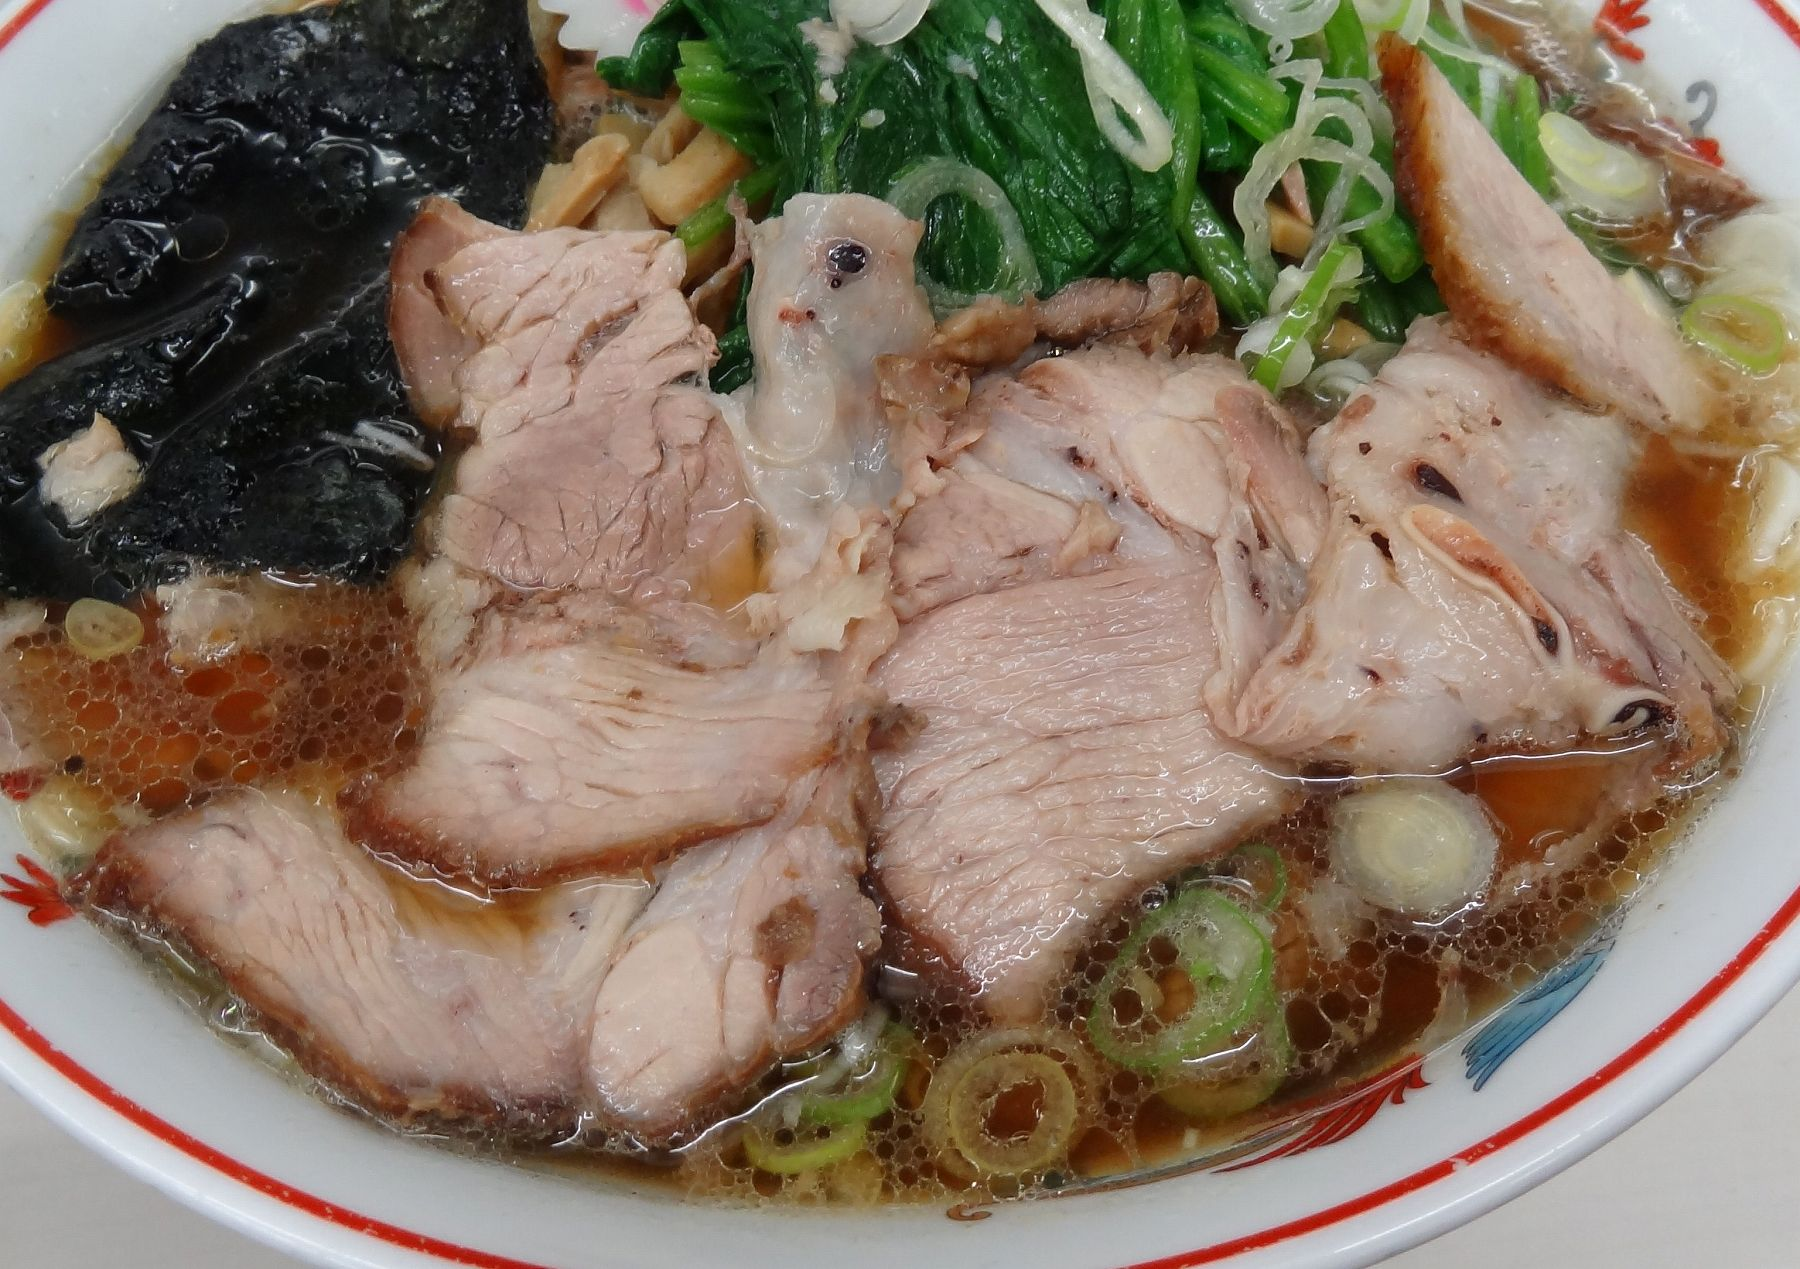 20121018003aoshima.jpg